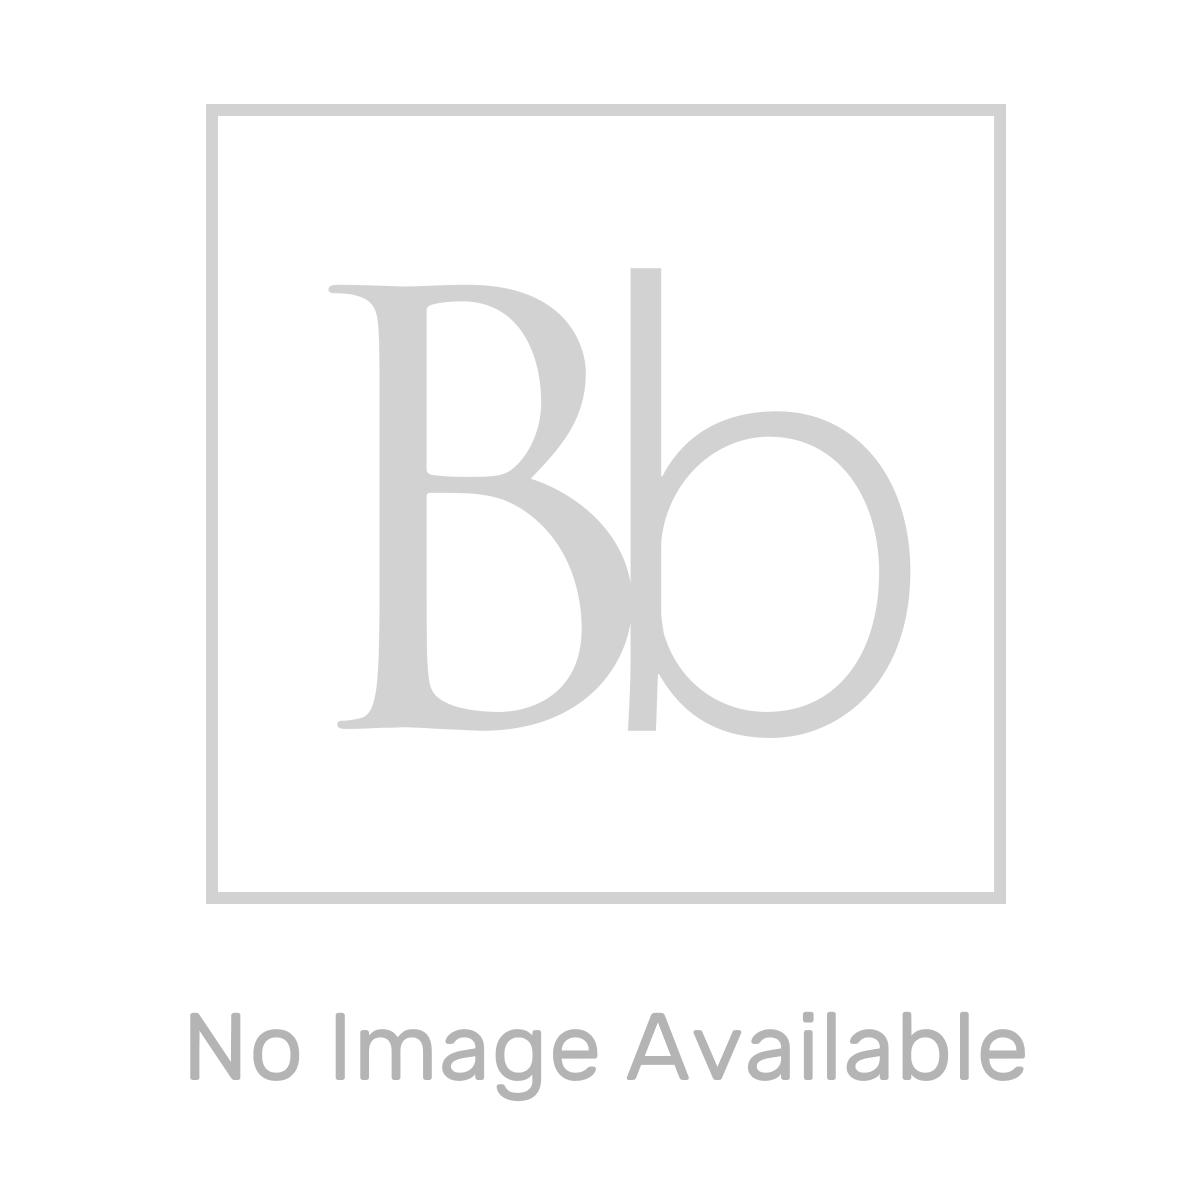 Reina Flat Anthracite Double Panel Designer Radiator 600 x 1254mm